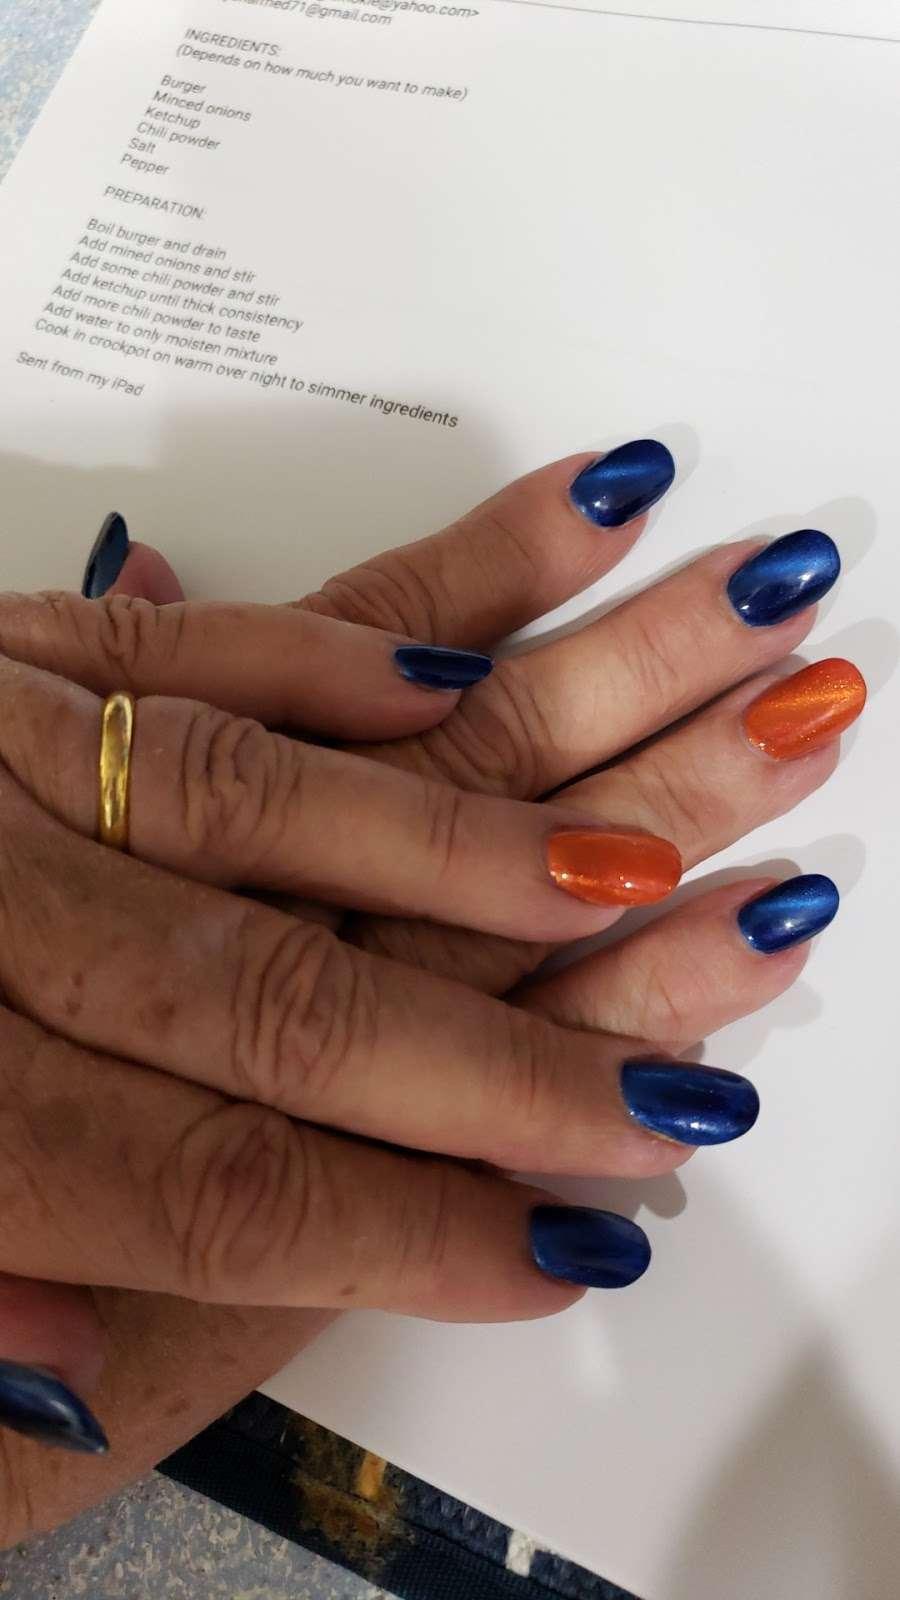 VIP Nails and Spa - spa    Photo 4 of 6   Address: 4713 E, FL-44, Wildwood, FL 34785, USA   Phone: (352) 661-3263